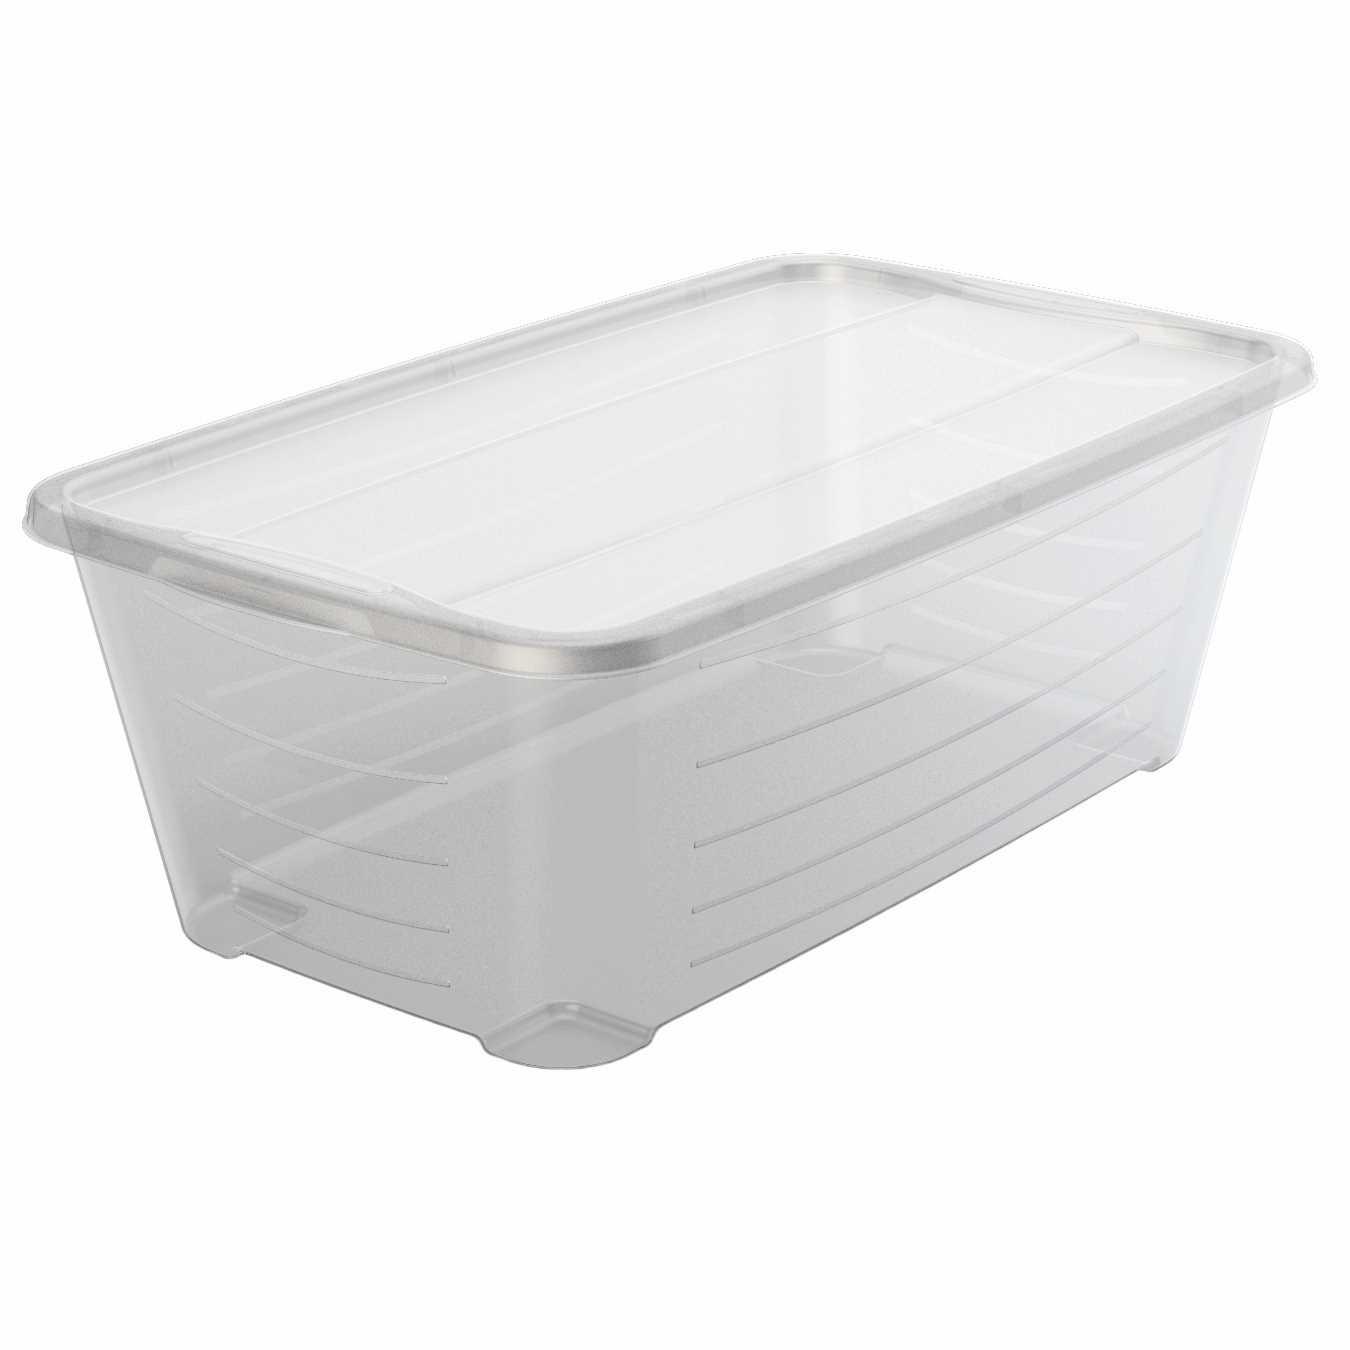 life story 6q rectangular clear plastic protective storage shoe box 8 pack 842372134934 ebay. Black Bedroom Furniture Sets. Home Design Ideas